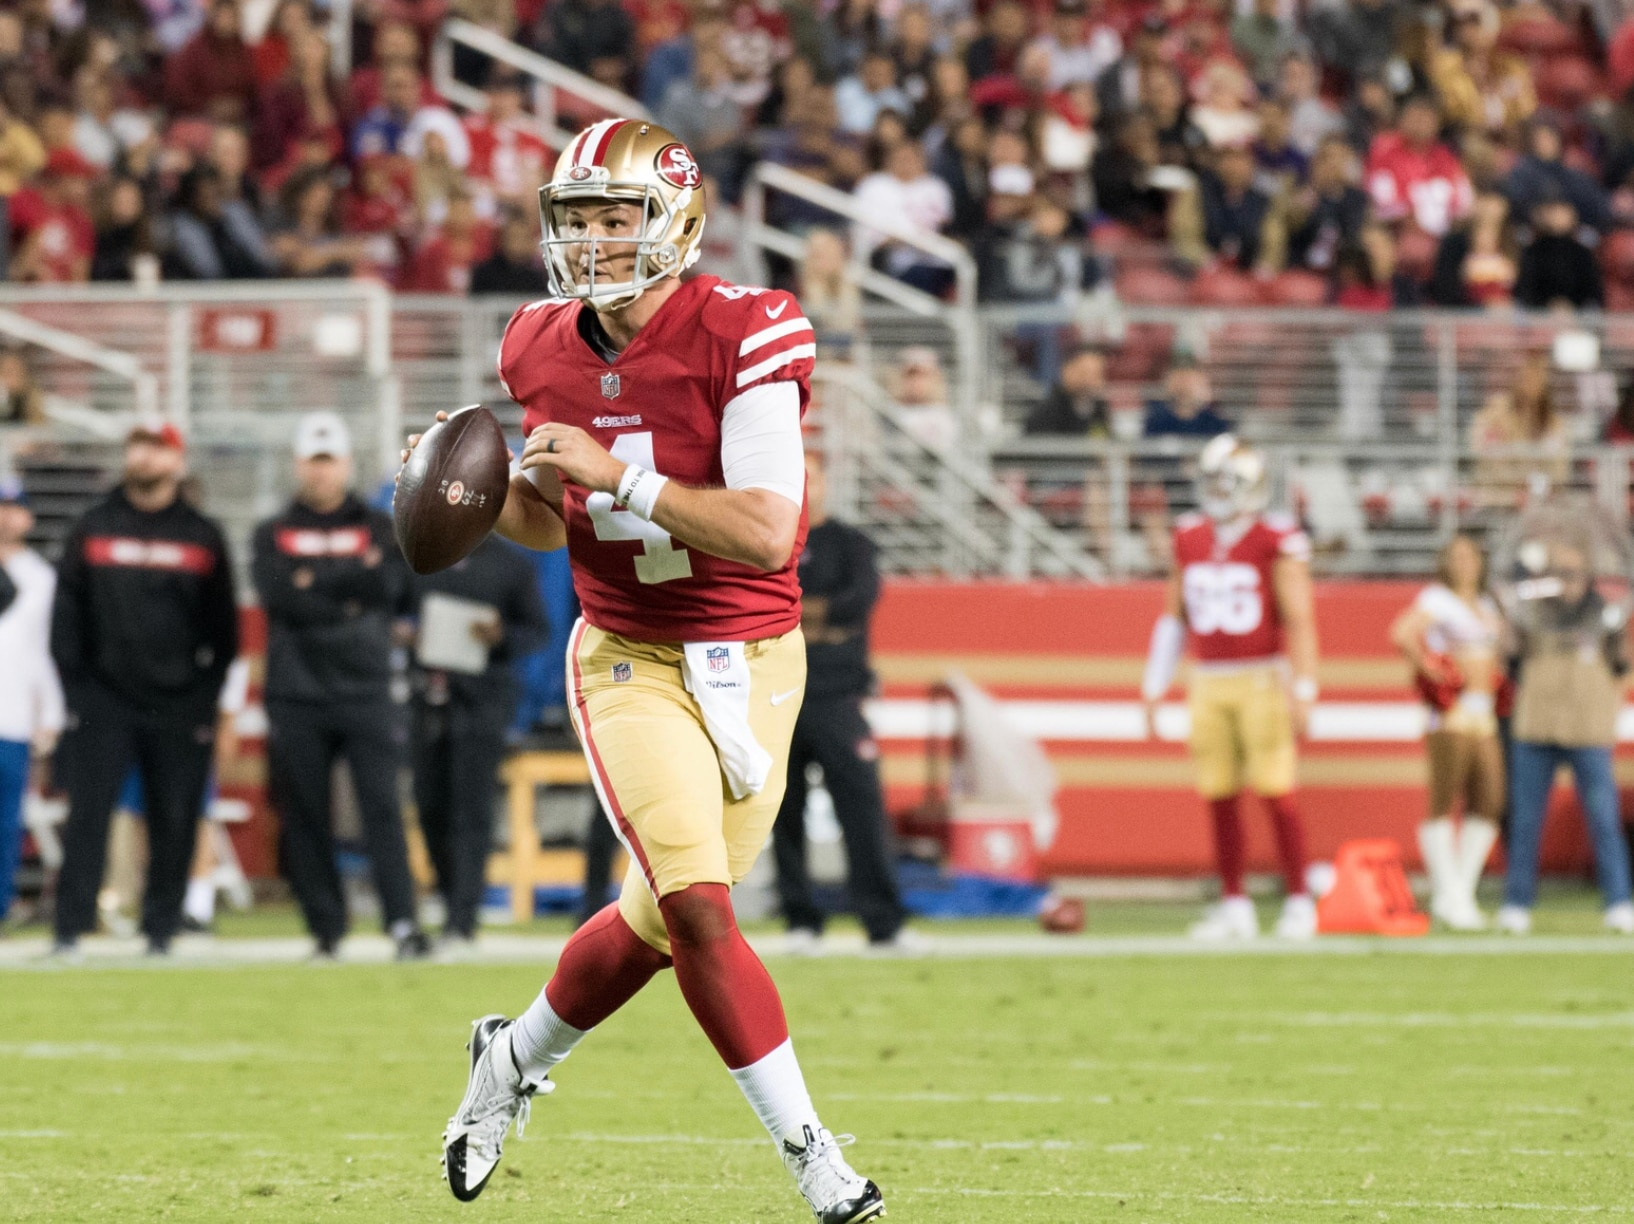 a2a16260faa Kyle Terada-USA TODAY Sports. Facebook · Twitter · LinkedIn · Email. San  Francisco 49ers quarterback Nick Mullens ...